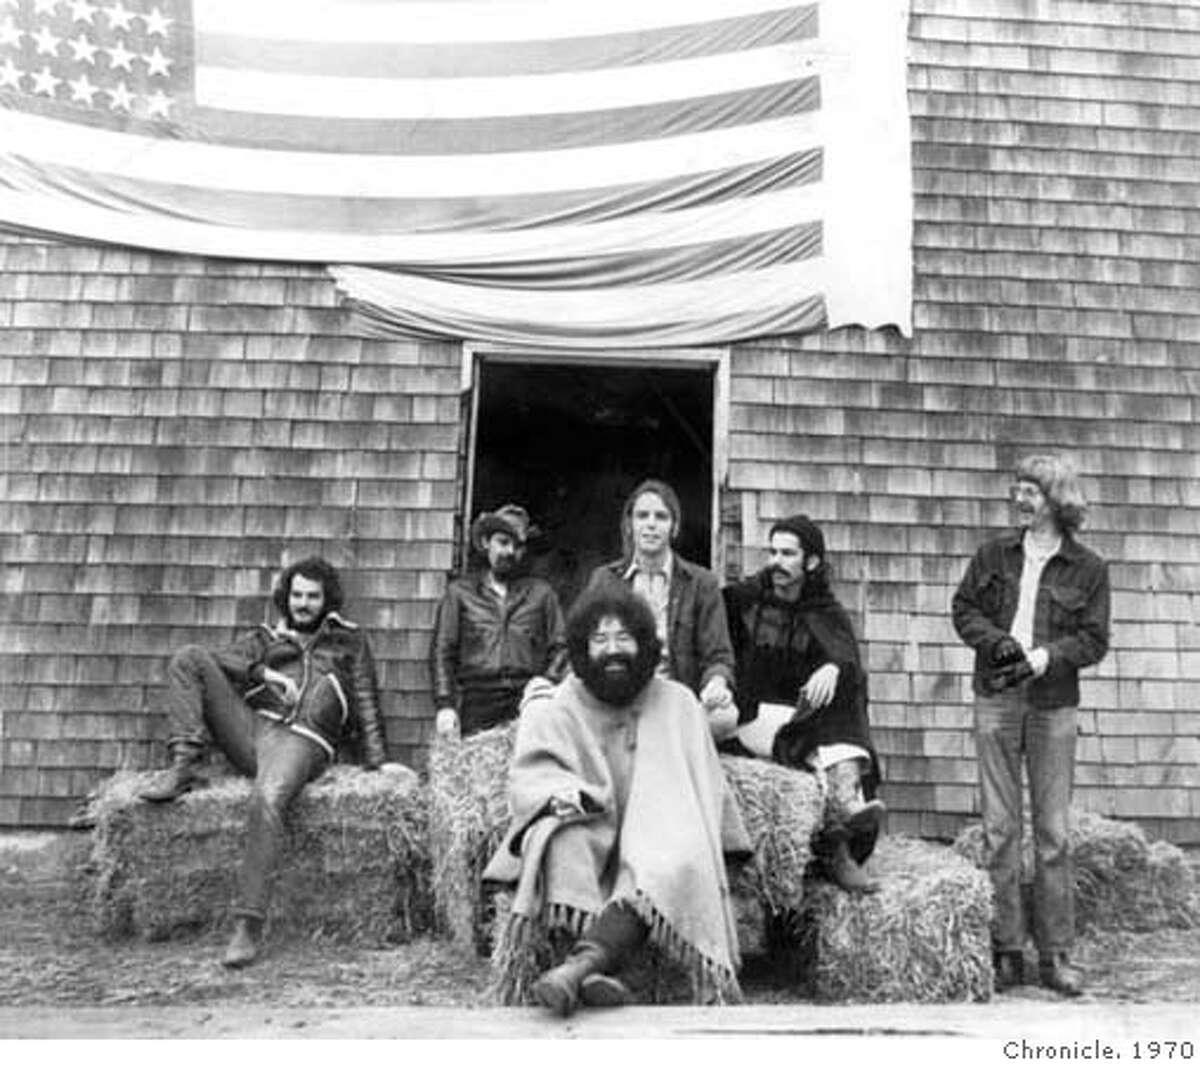 Grateful Dead circa 1970